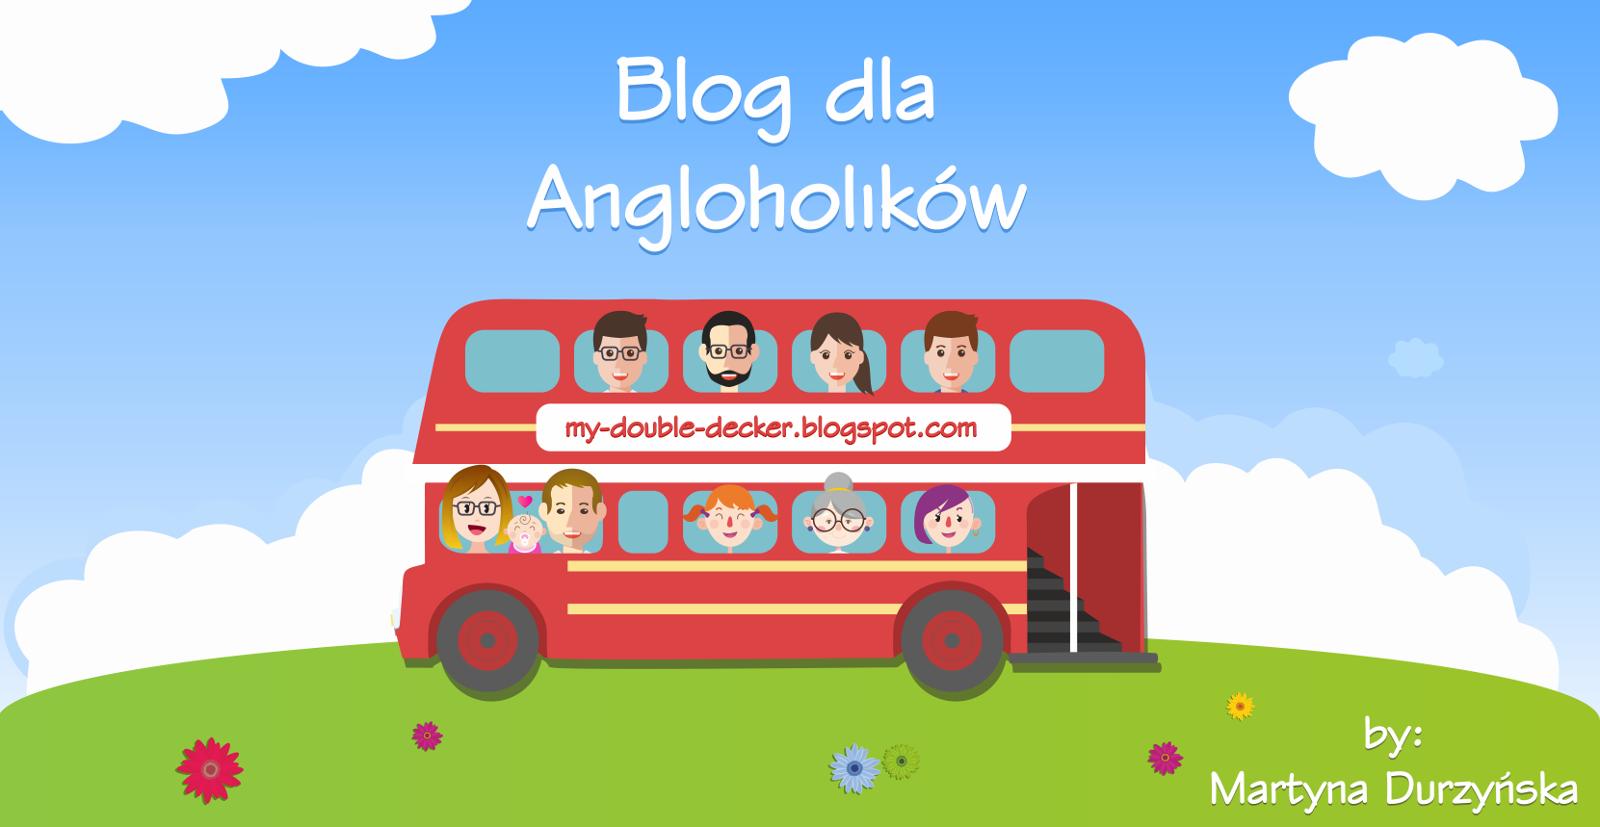 Blog dla Angloholików